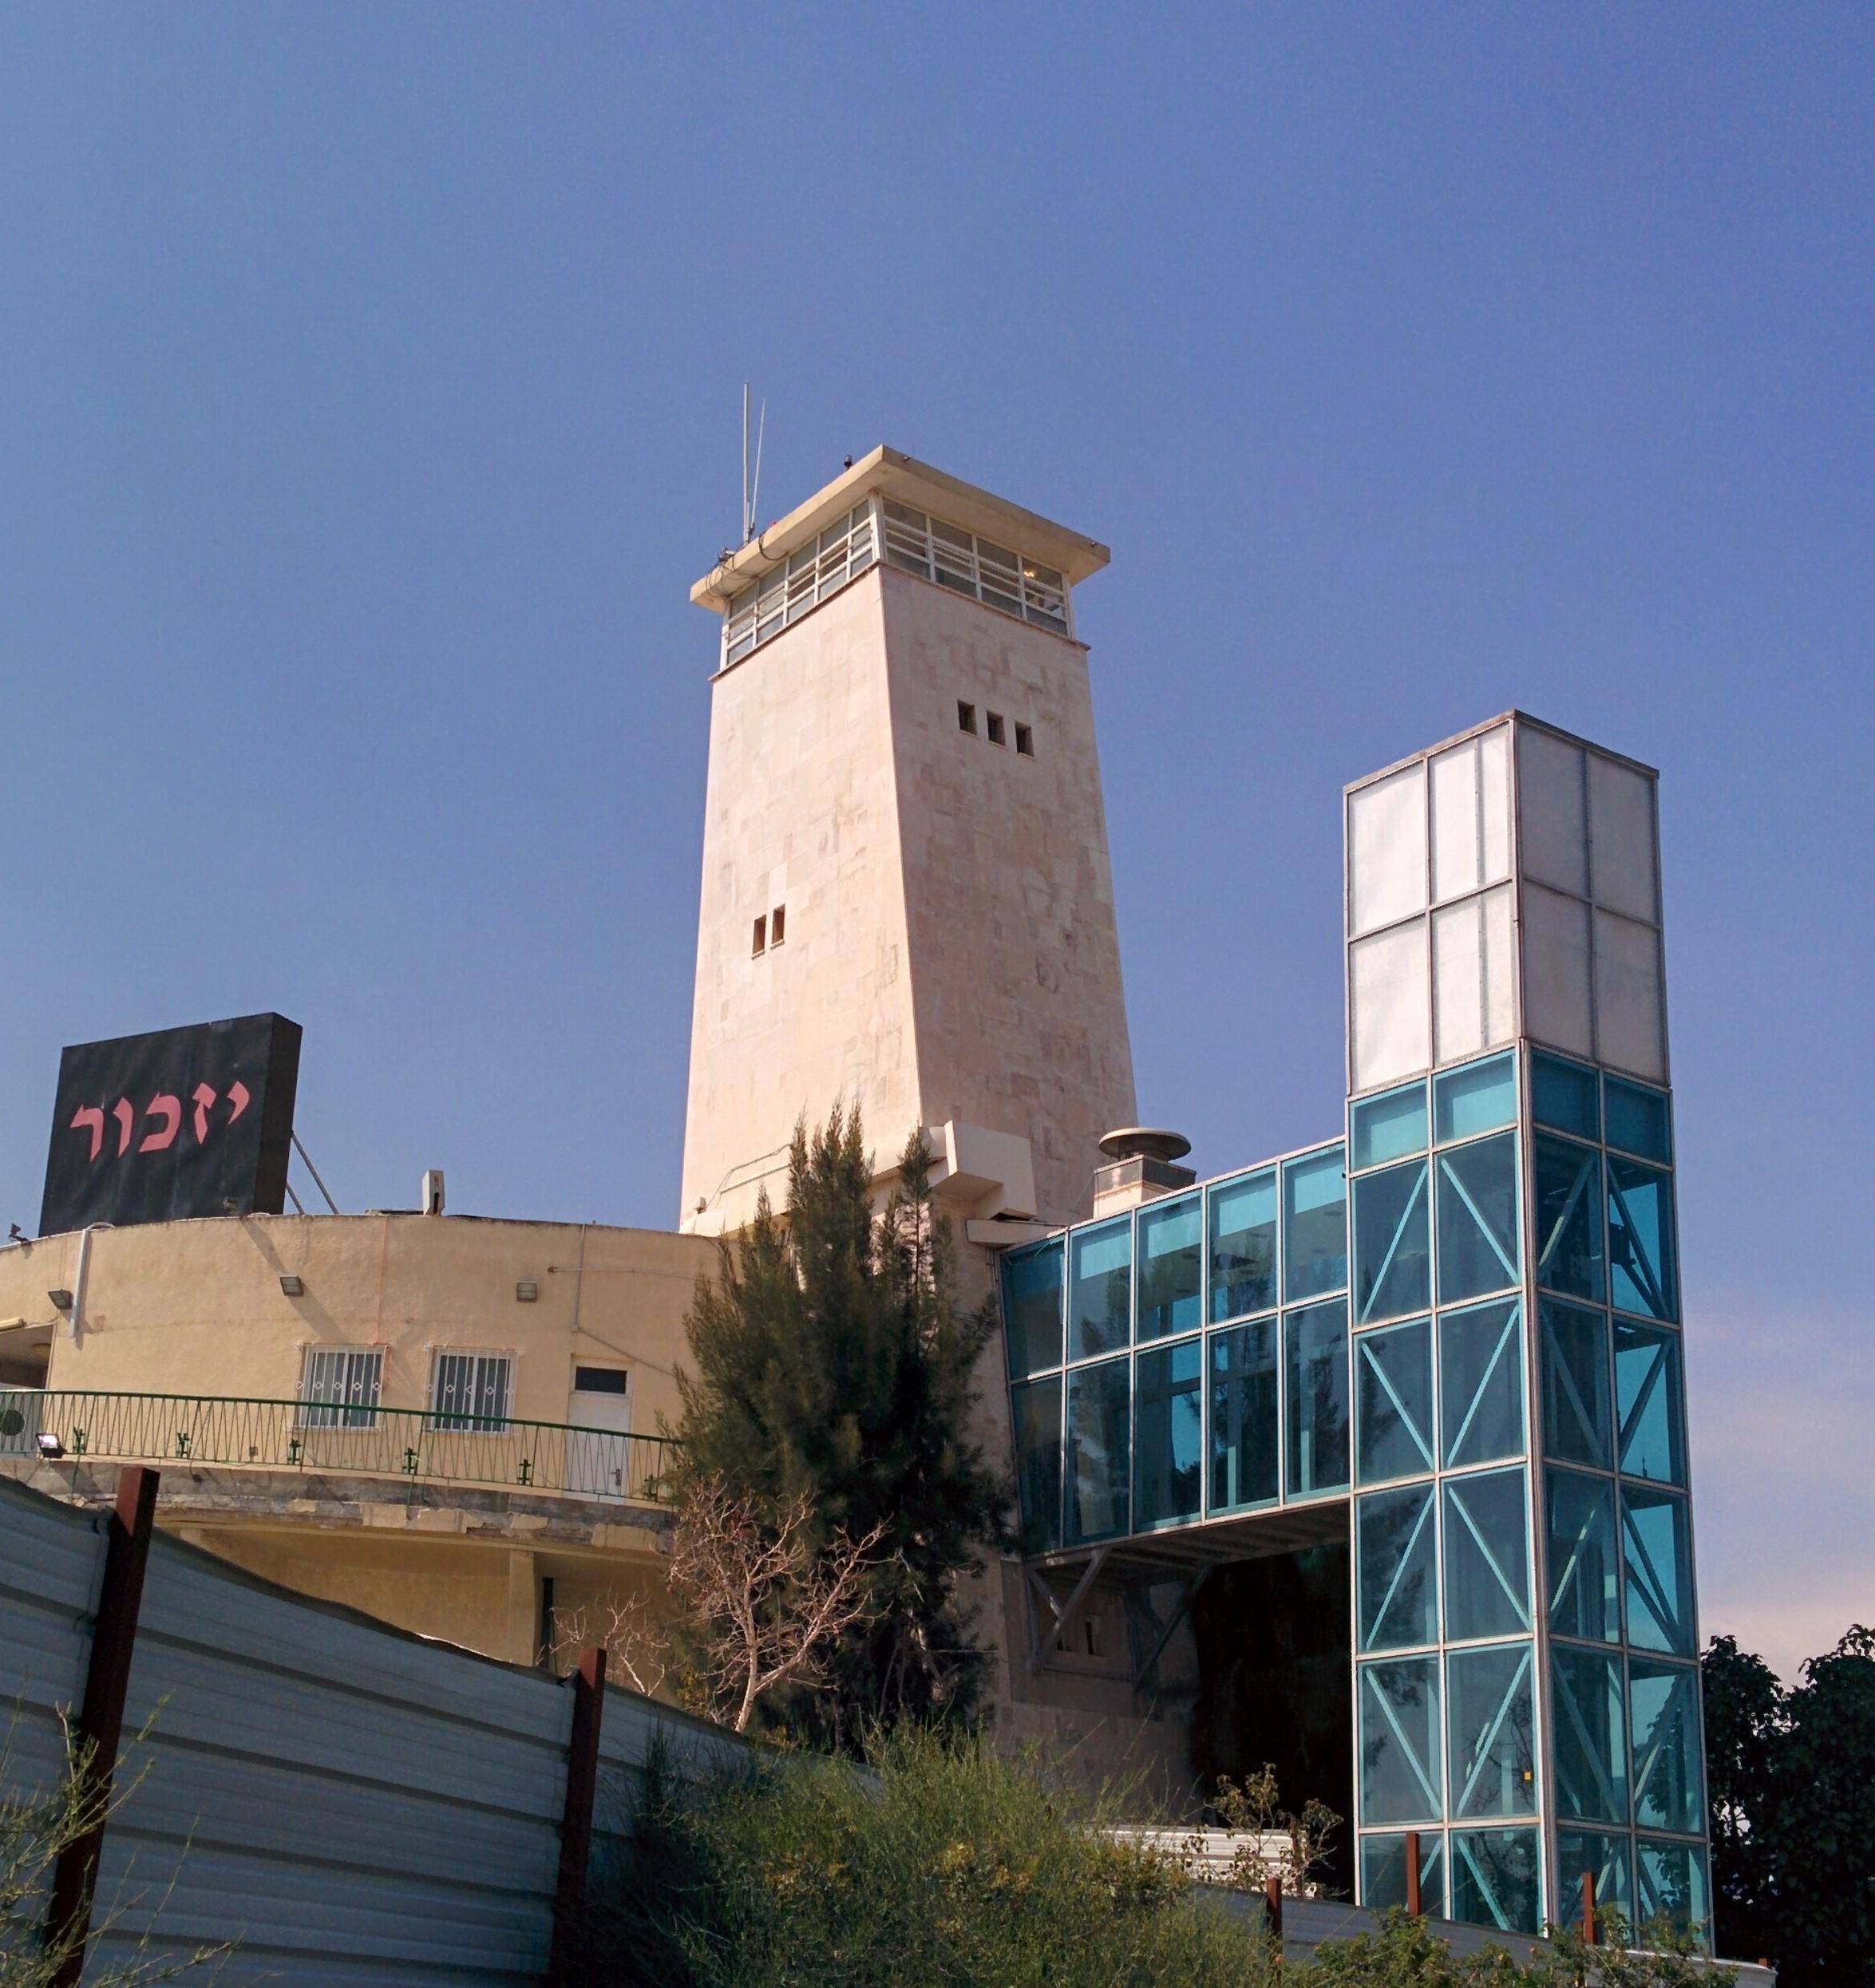 File:Beit Yad LaBanim, Ramat Gan.jpg - Wikimedia Commons